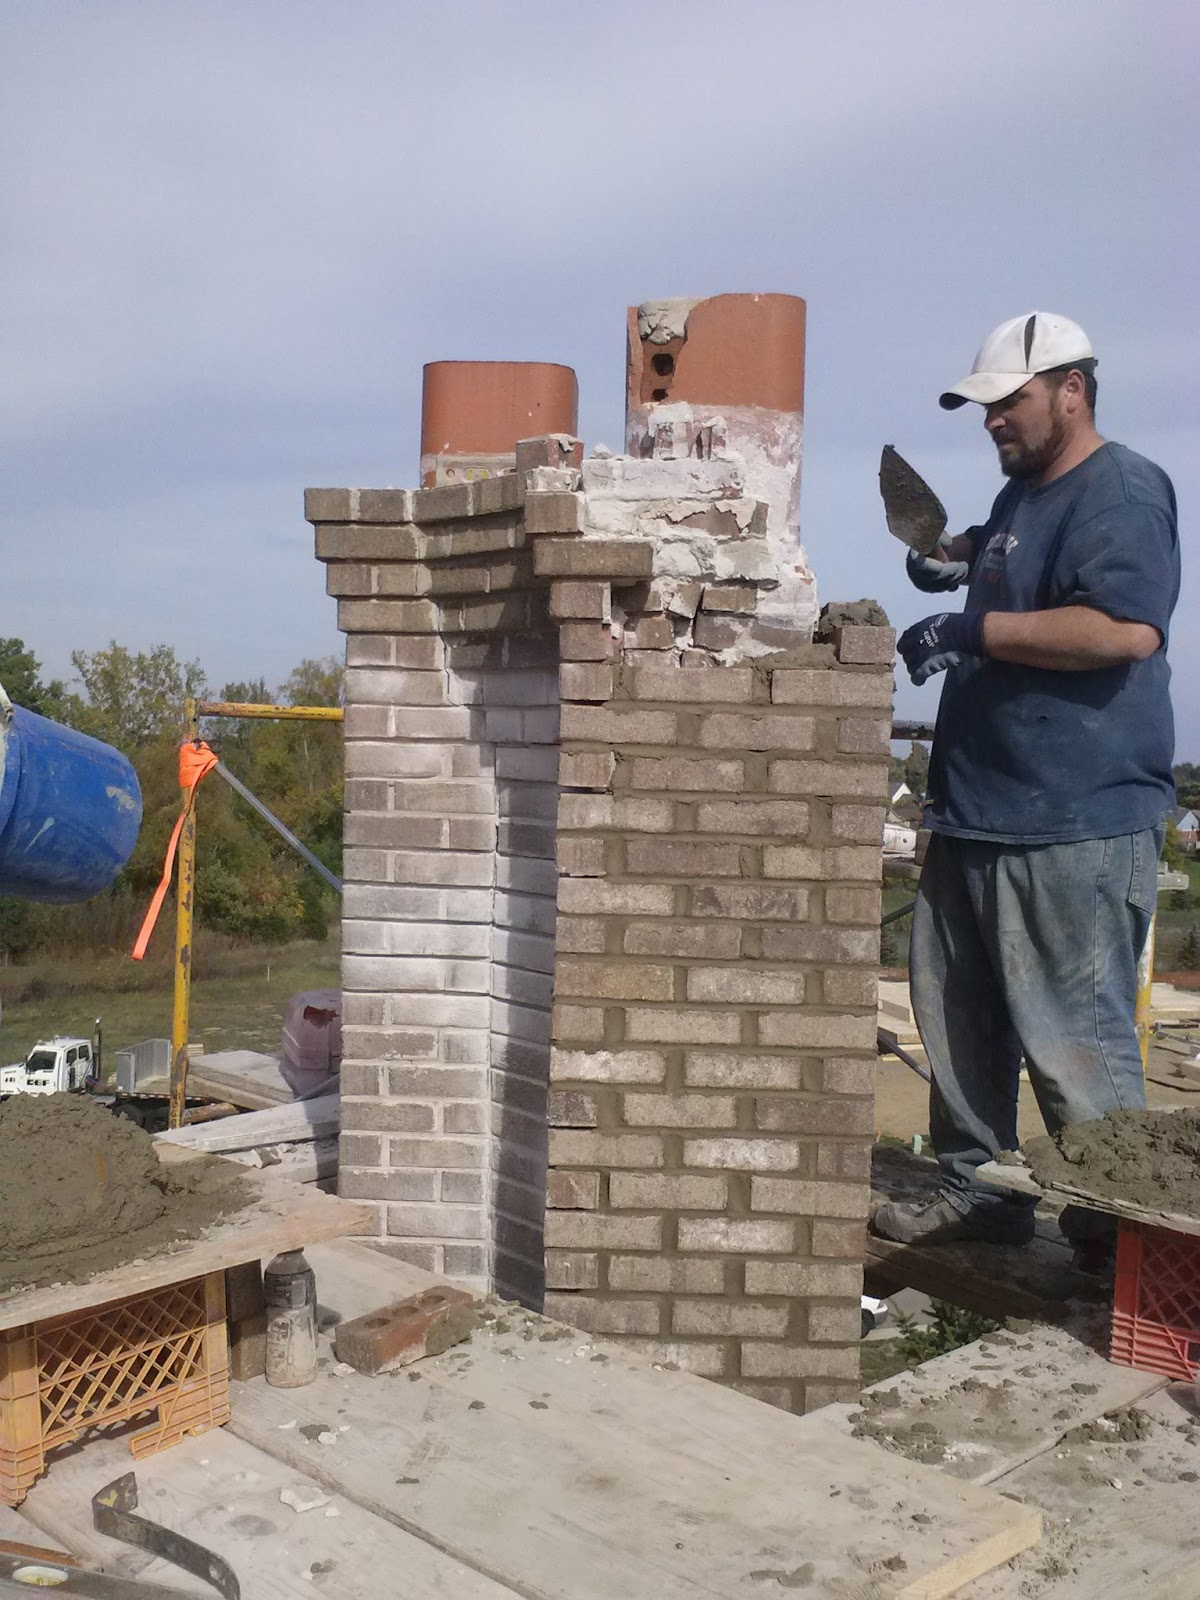 Marvelous West Bloomfield Chimney Repair 248 202 5740 Download Free Architecture Designs Grimeyleaguecom